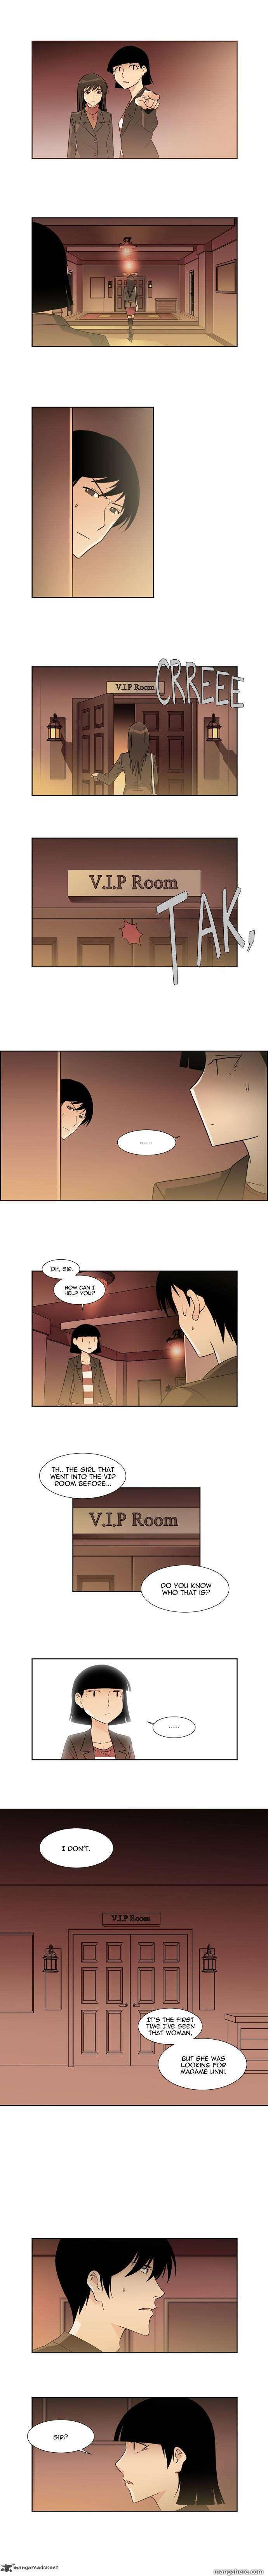 Melo Holic 47 Page 2